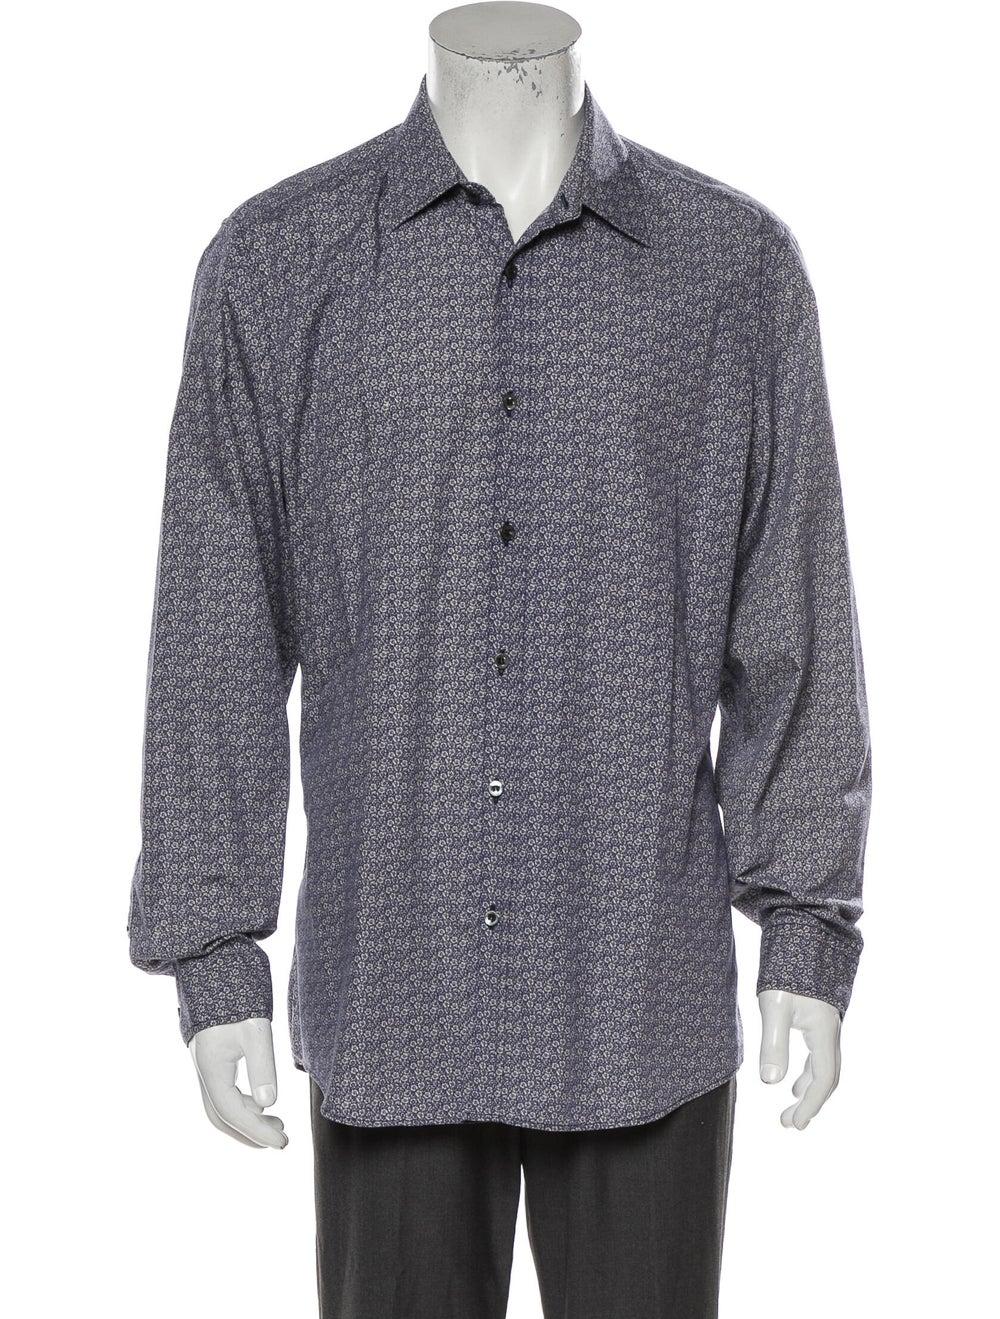 Gucci Floral Print Long Sleeve Shirt Blue - image 1